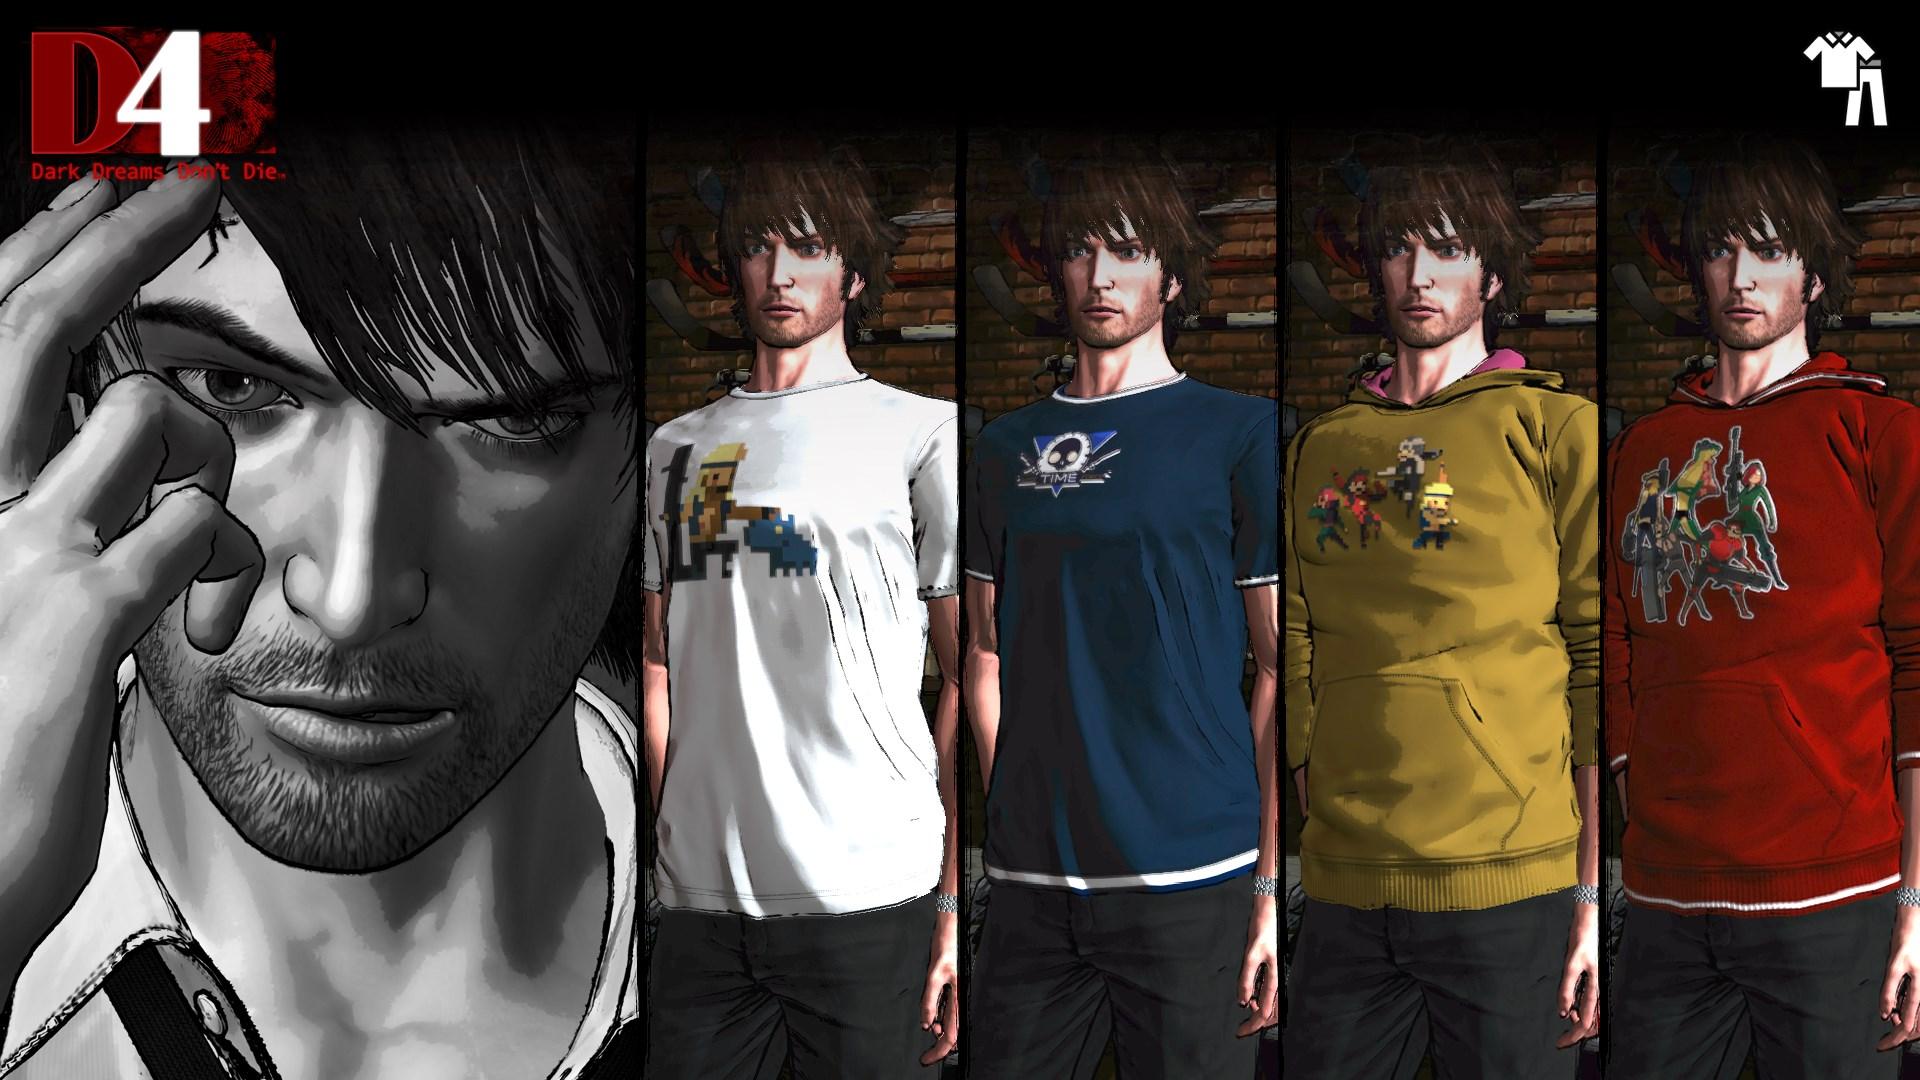 D4: Dark Dreams Don't Die - Super Time Force Clothing Set